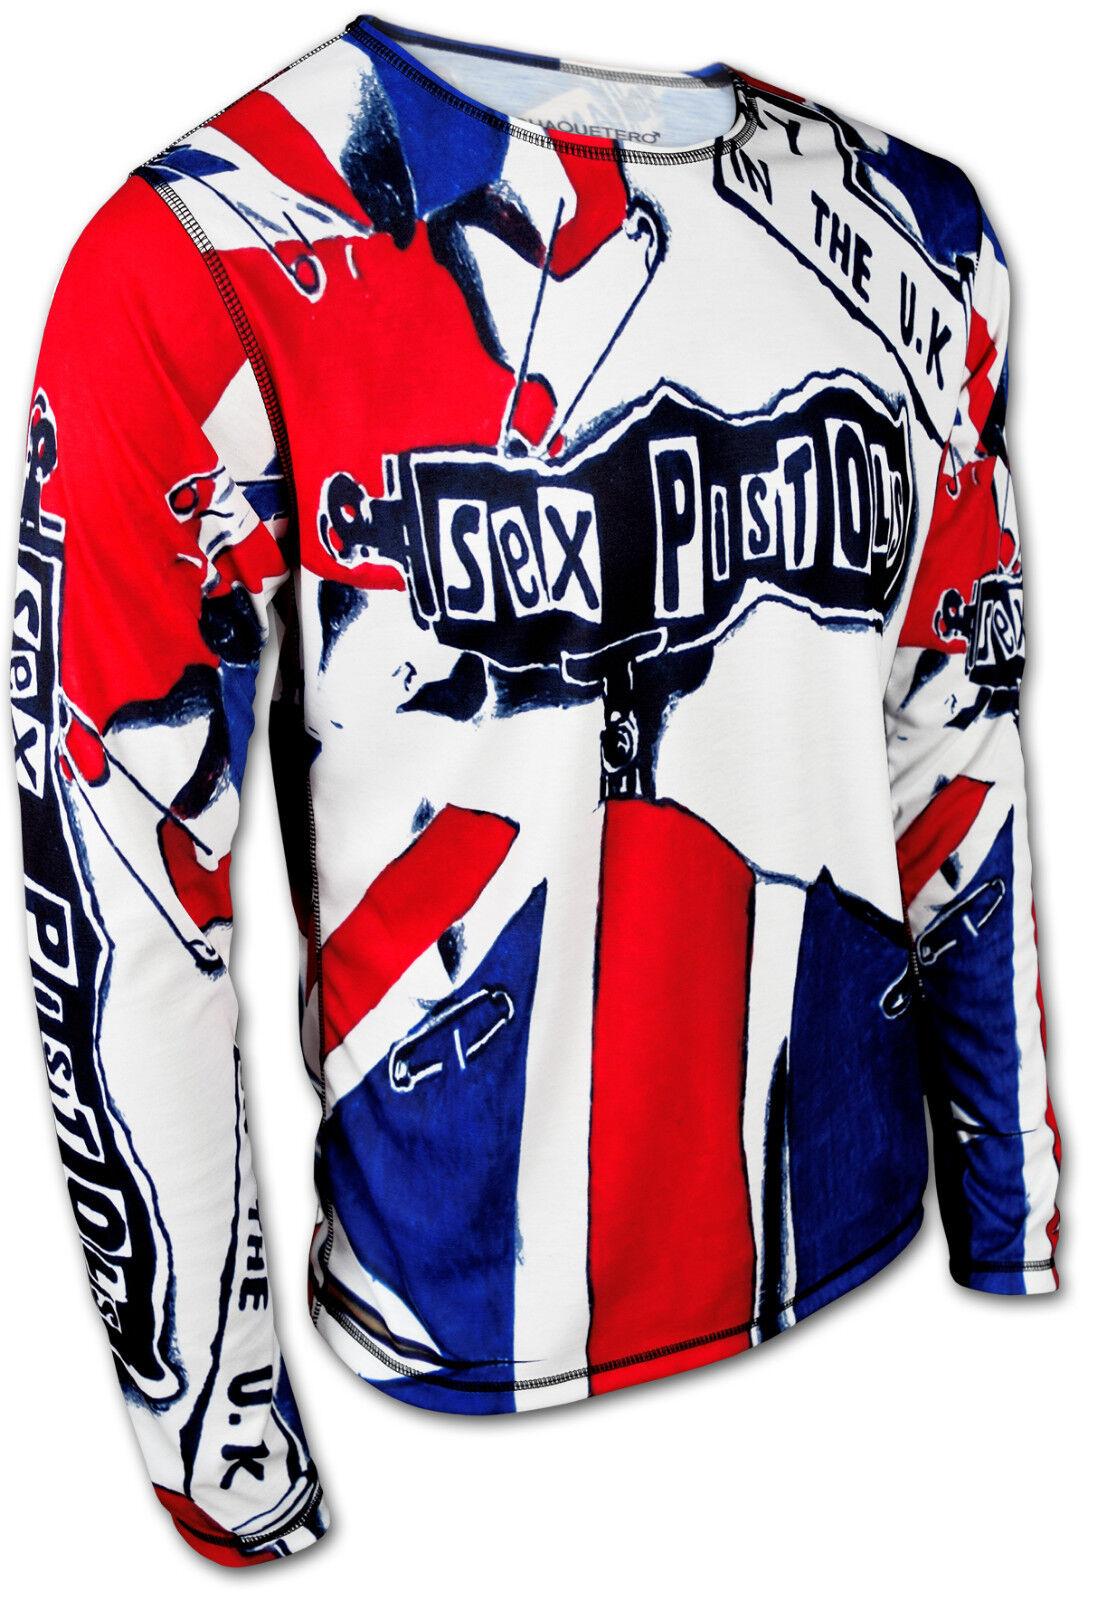 Sex Pistols Sweatshirt langärmliges T-Shirt Pullover Longsleeve Longshirt Herren